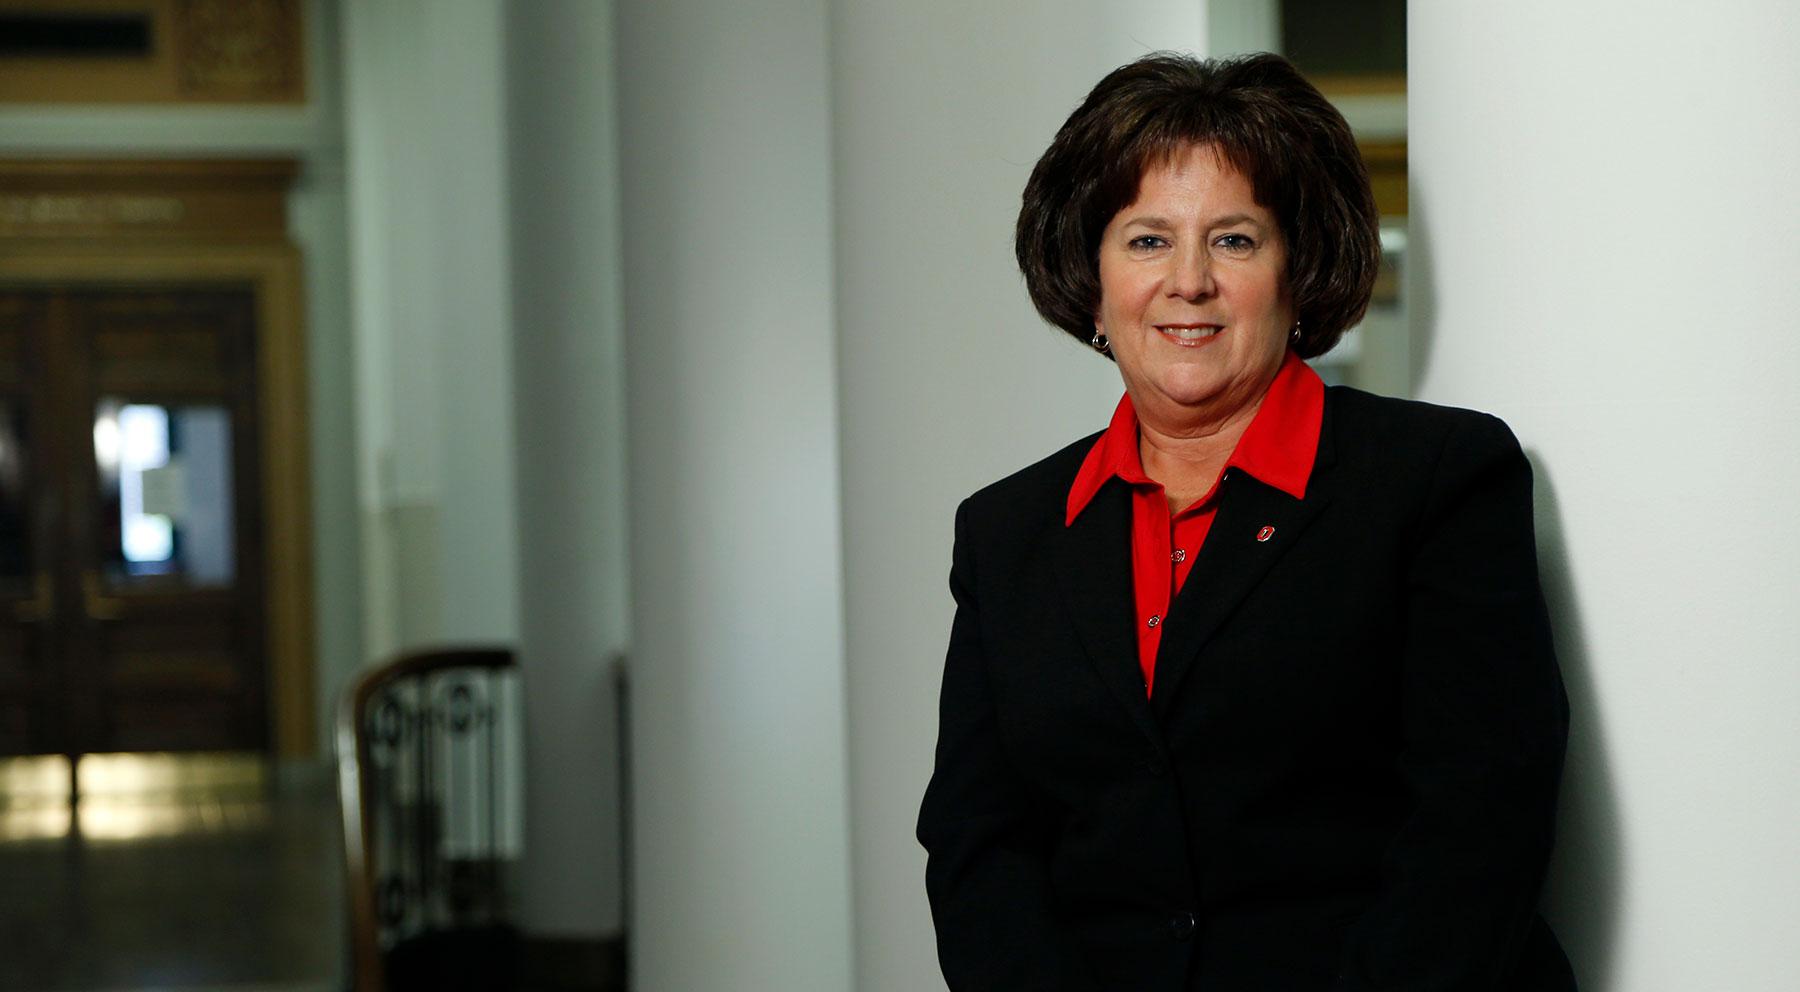 Susan Basso